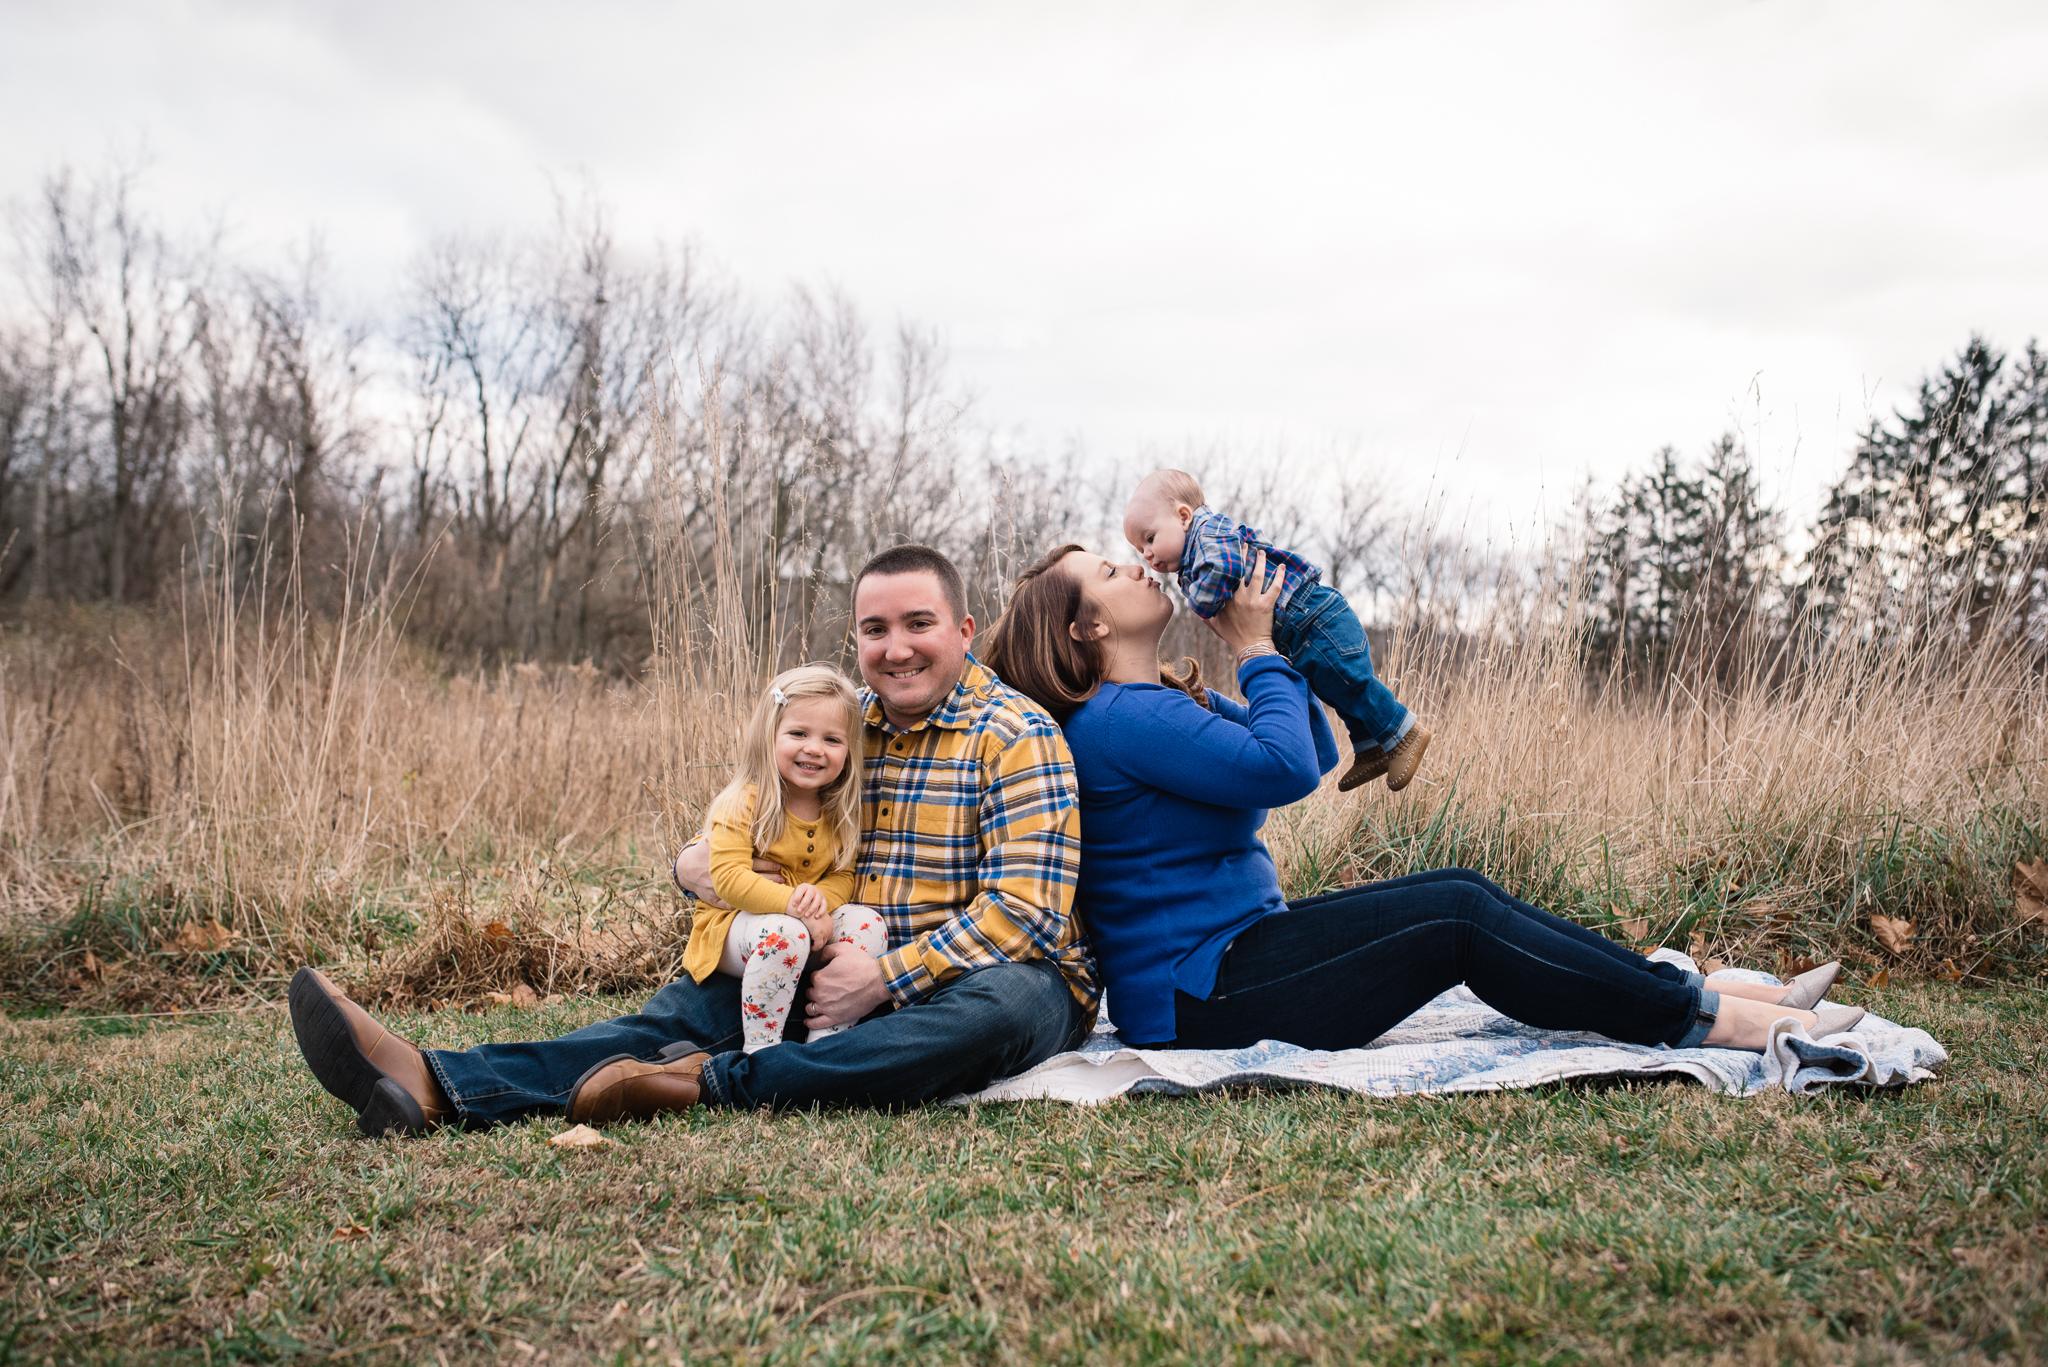 bucks-county-family-photographer-jillian-b-photography